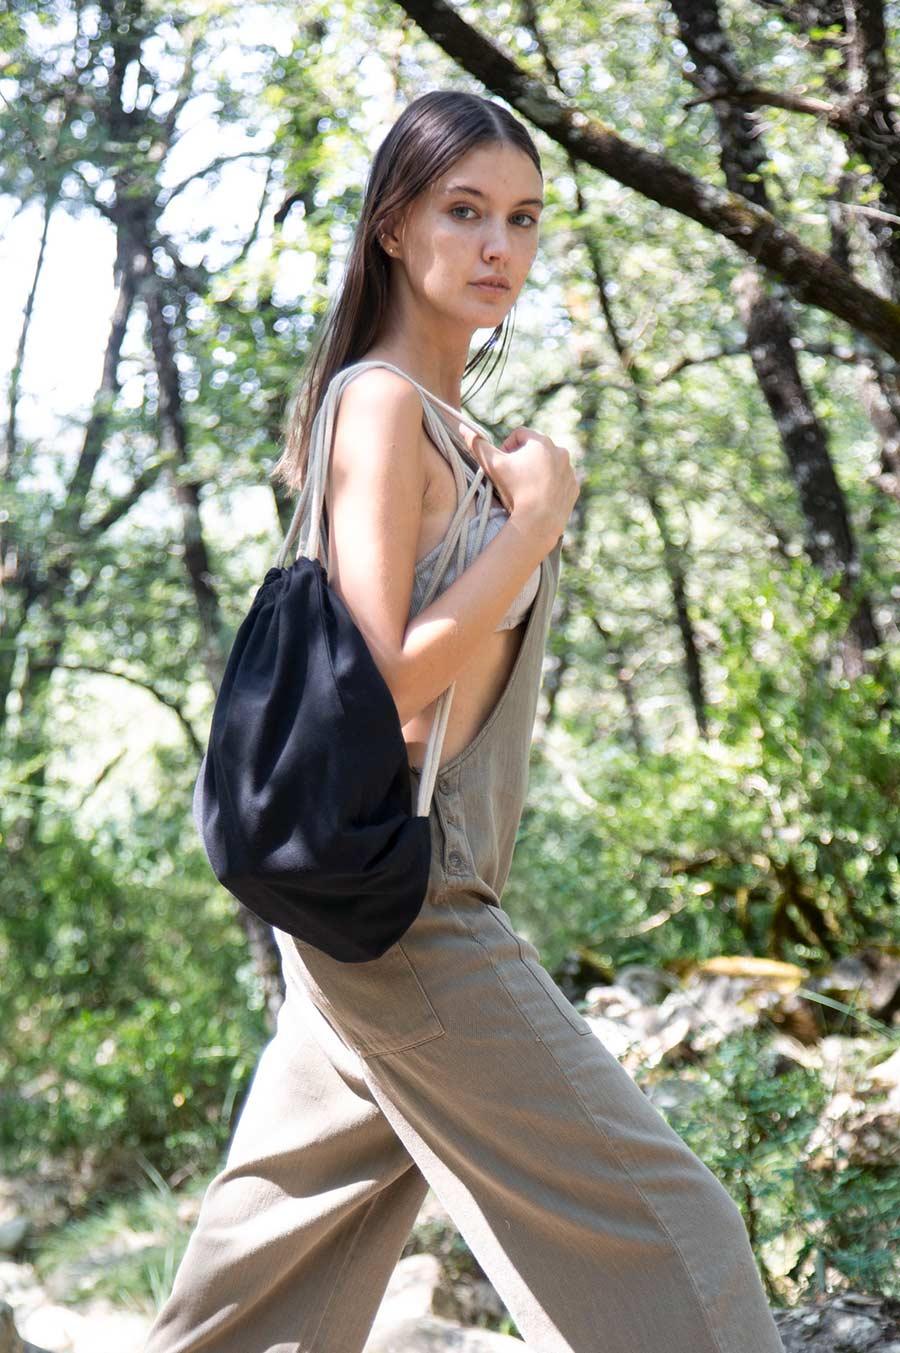 KI5102 Small Recycled Backpack